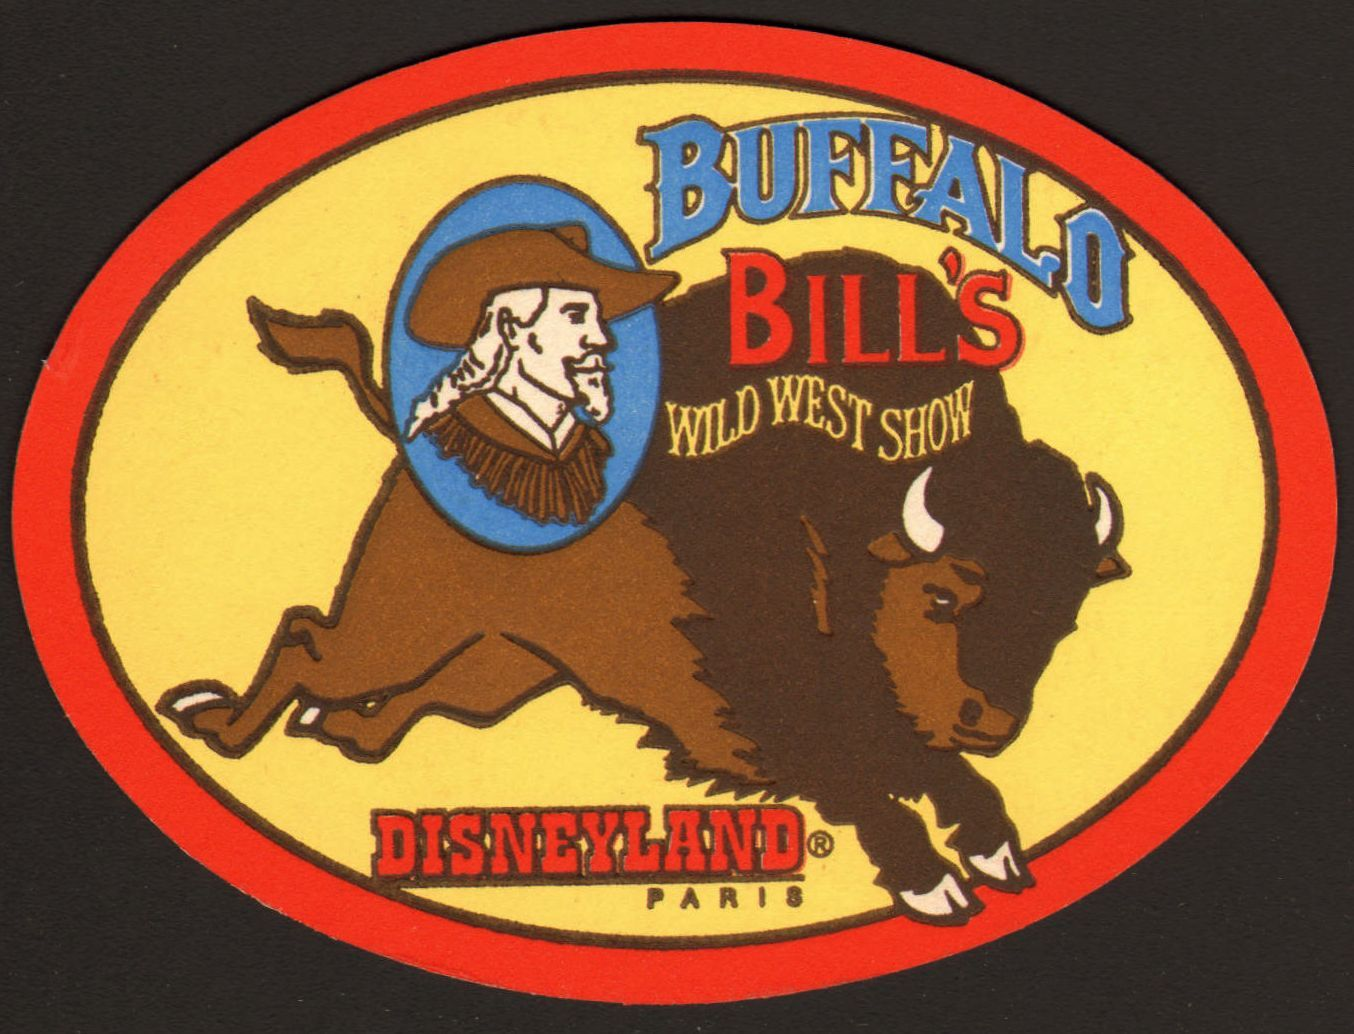 Buffalo Bill S Wild West Show Disneyland Paris Disneyland Paris Beer Coasters Wild West Show